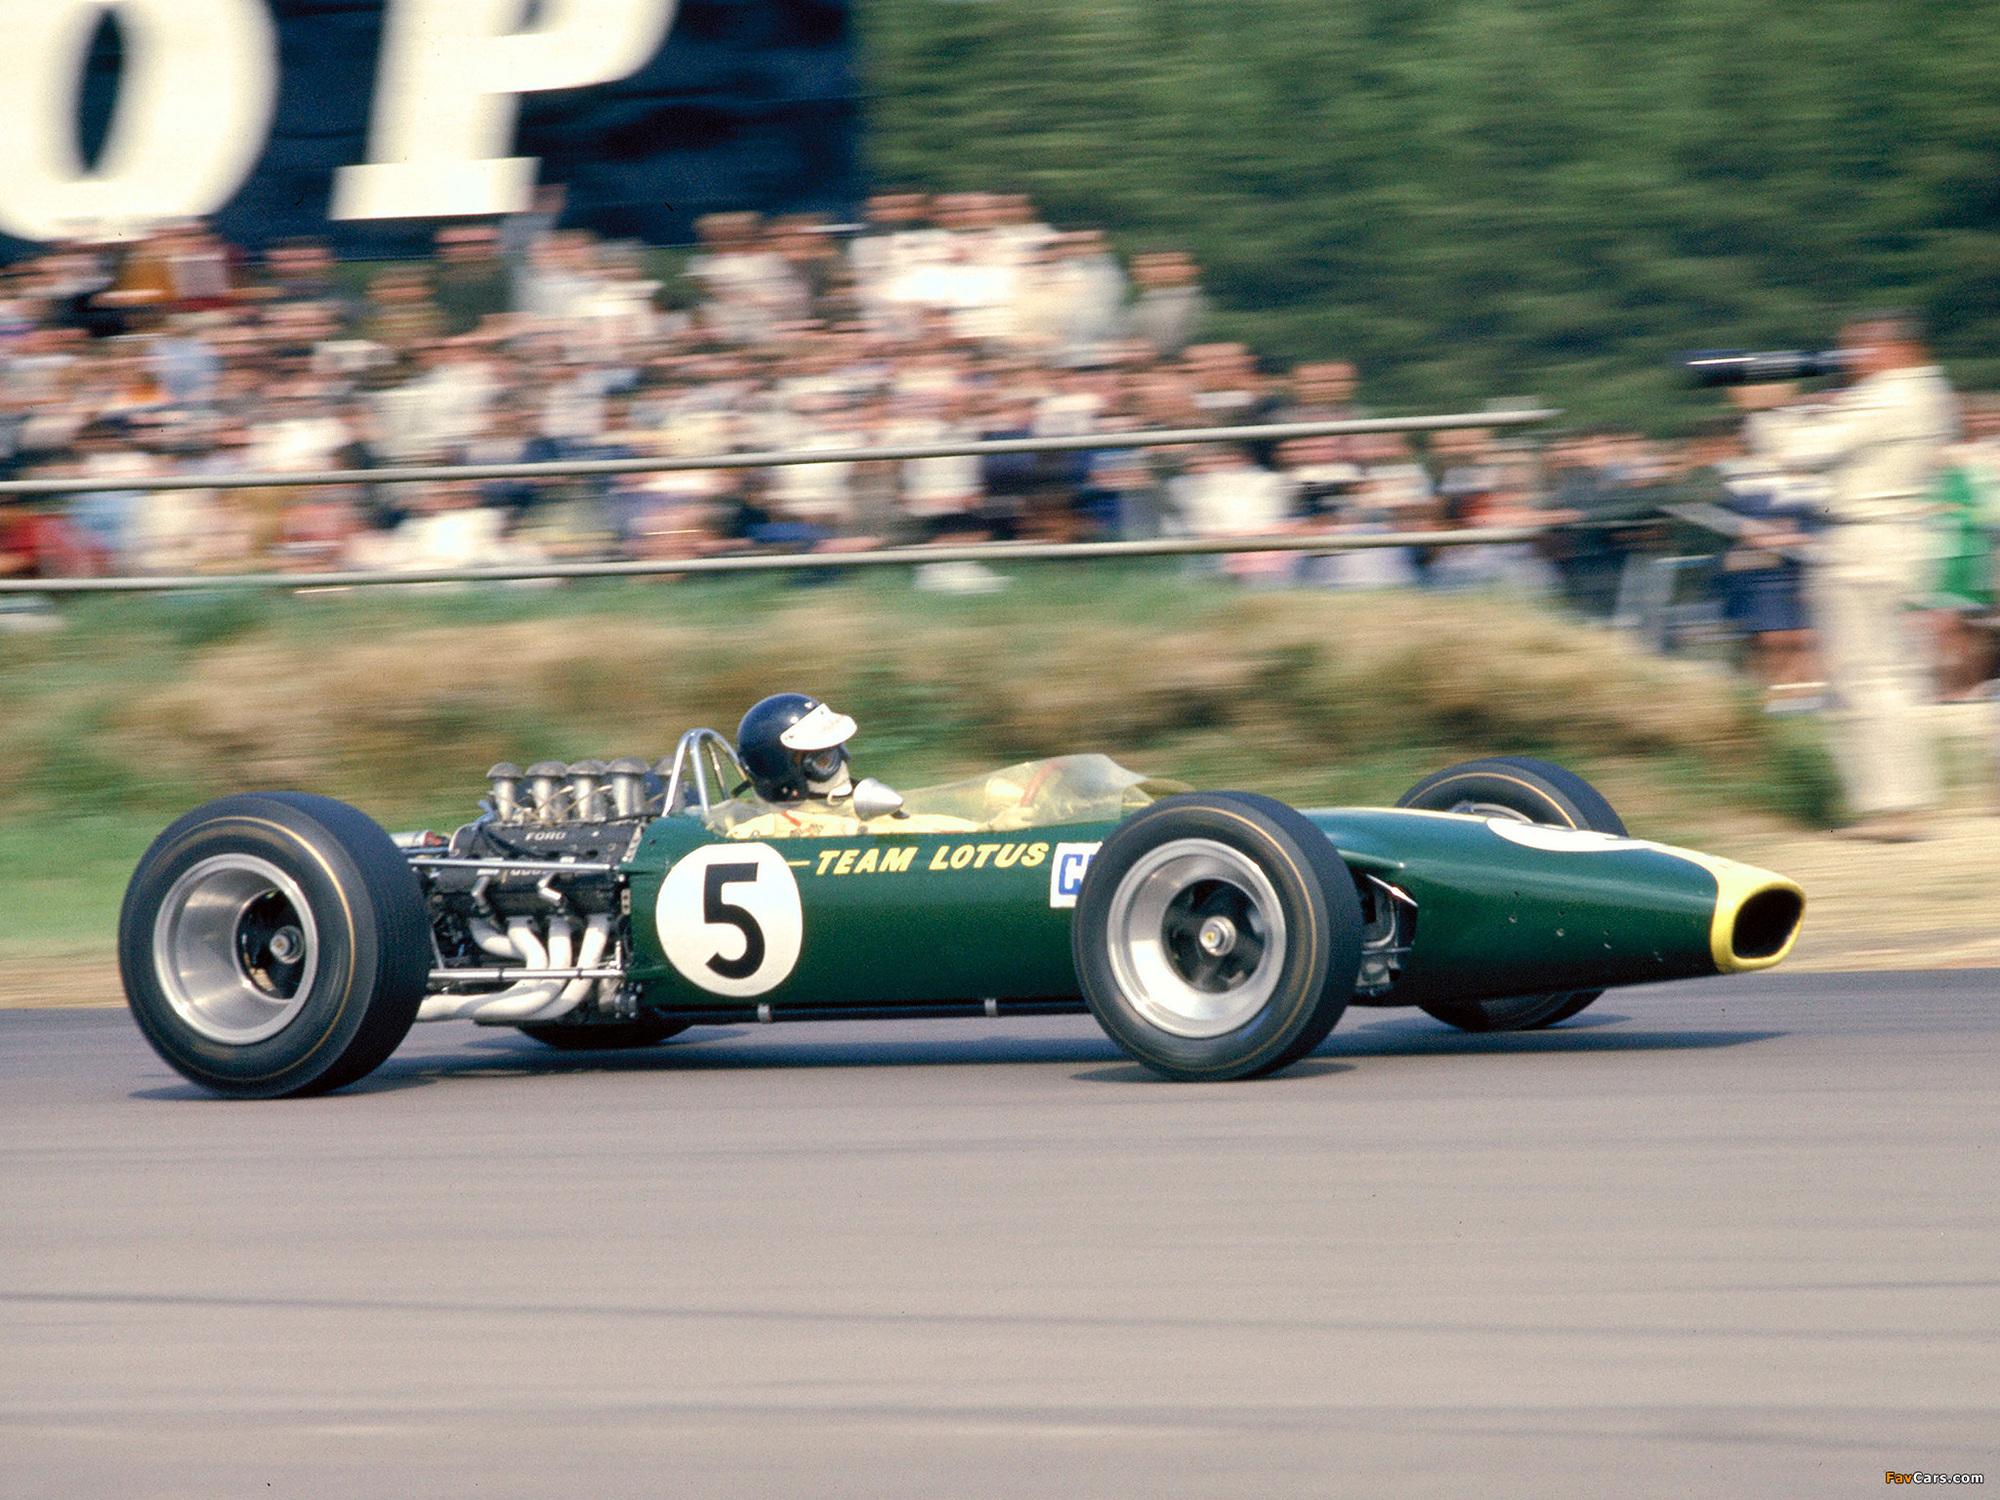 Lotus_formula_1_1967_wallpapers_1